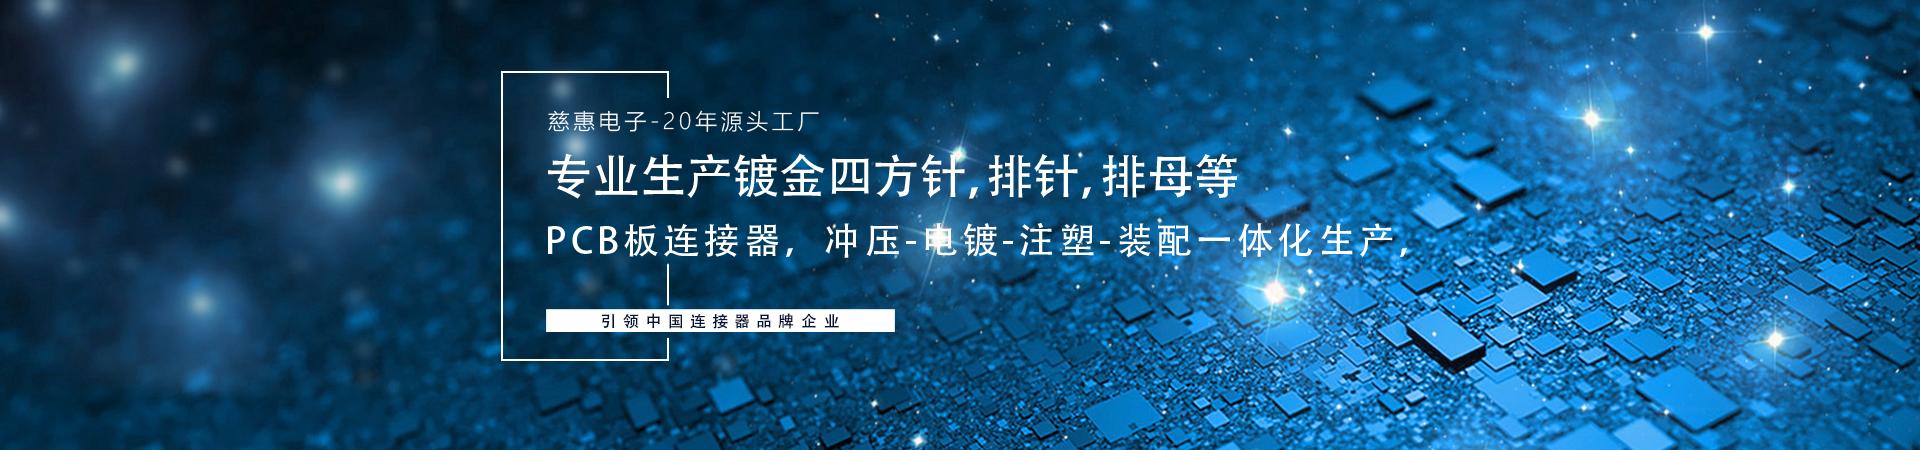 http://www.cncihui.com/data/upload/202103/20210325113925_770.jpg